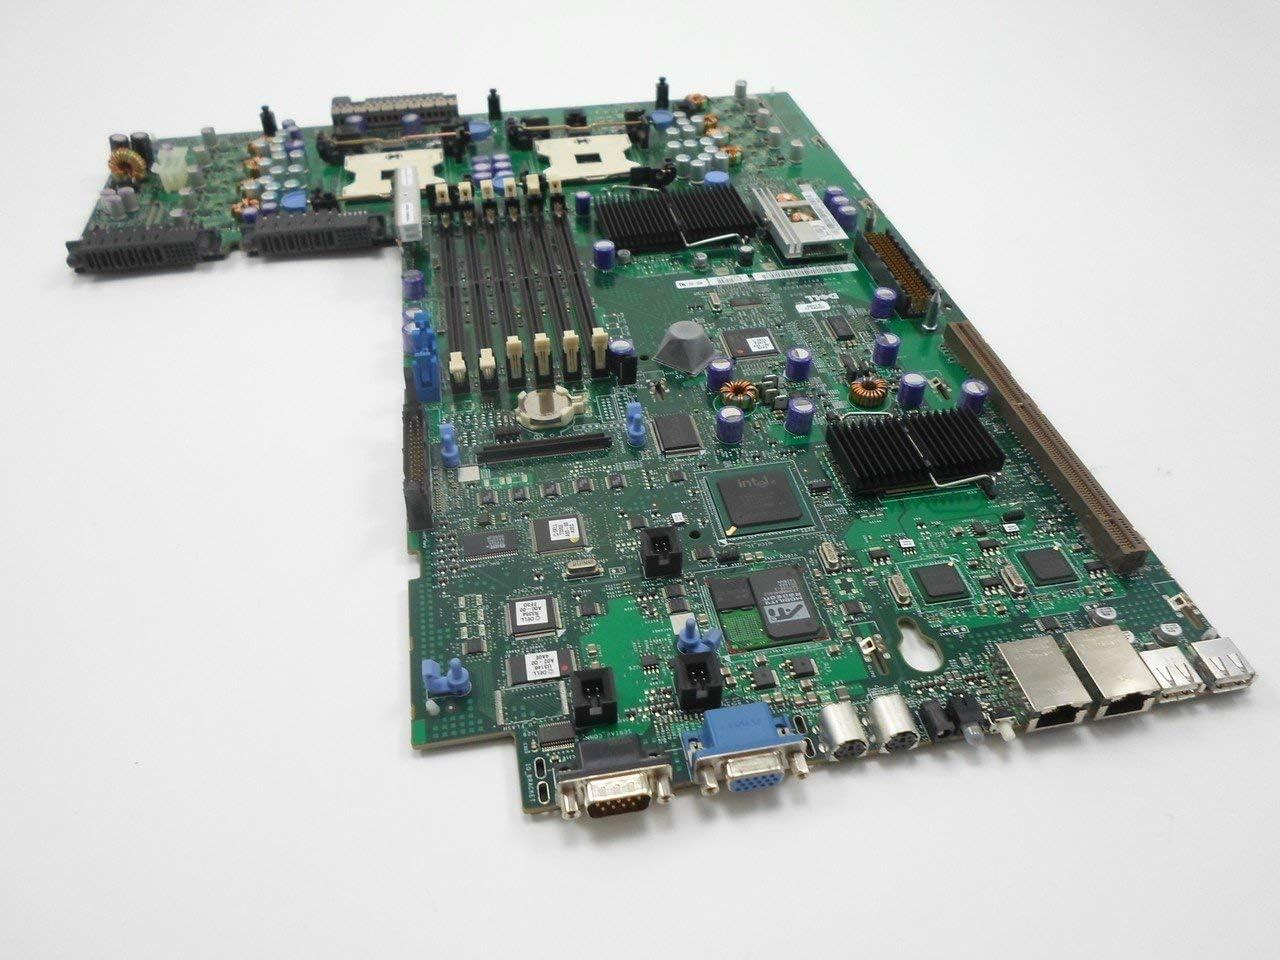 Sparepart: Dell Assy Motherboard Sv Msi Pe2800Refurbished, X7322Refurbished V3 Renewed